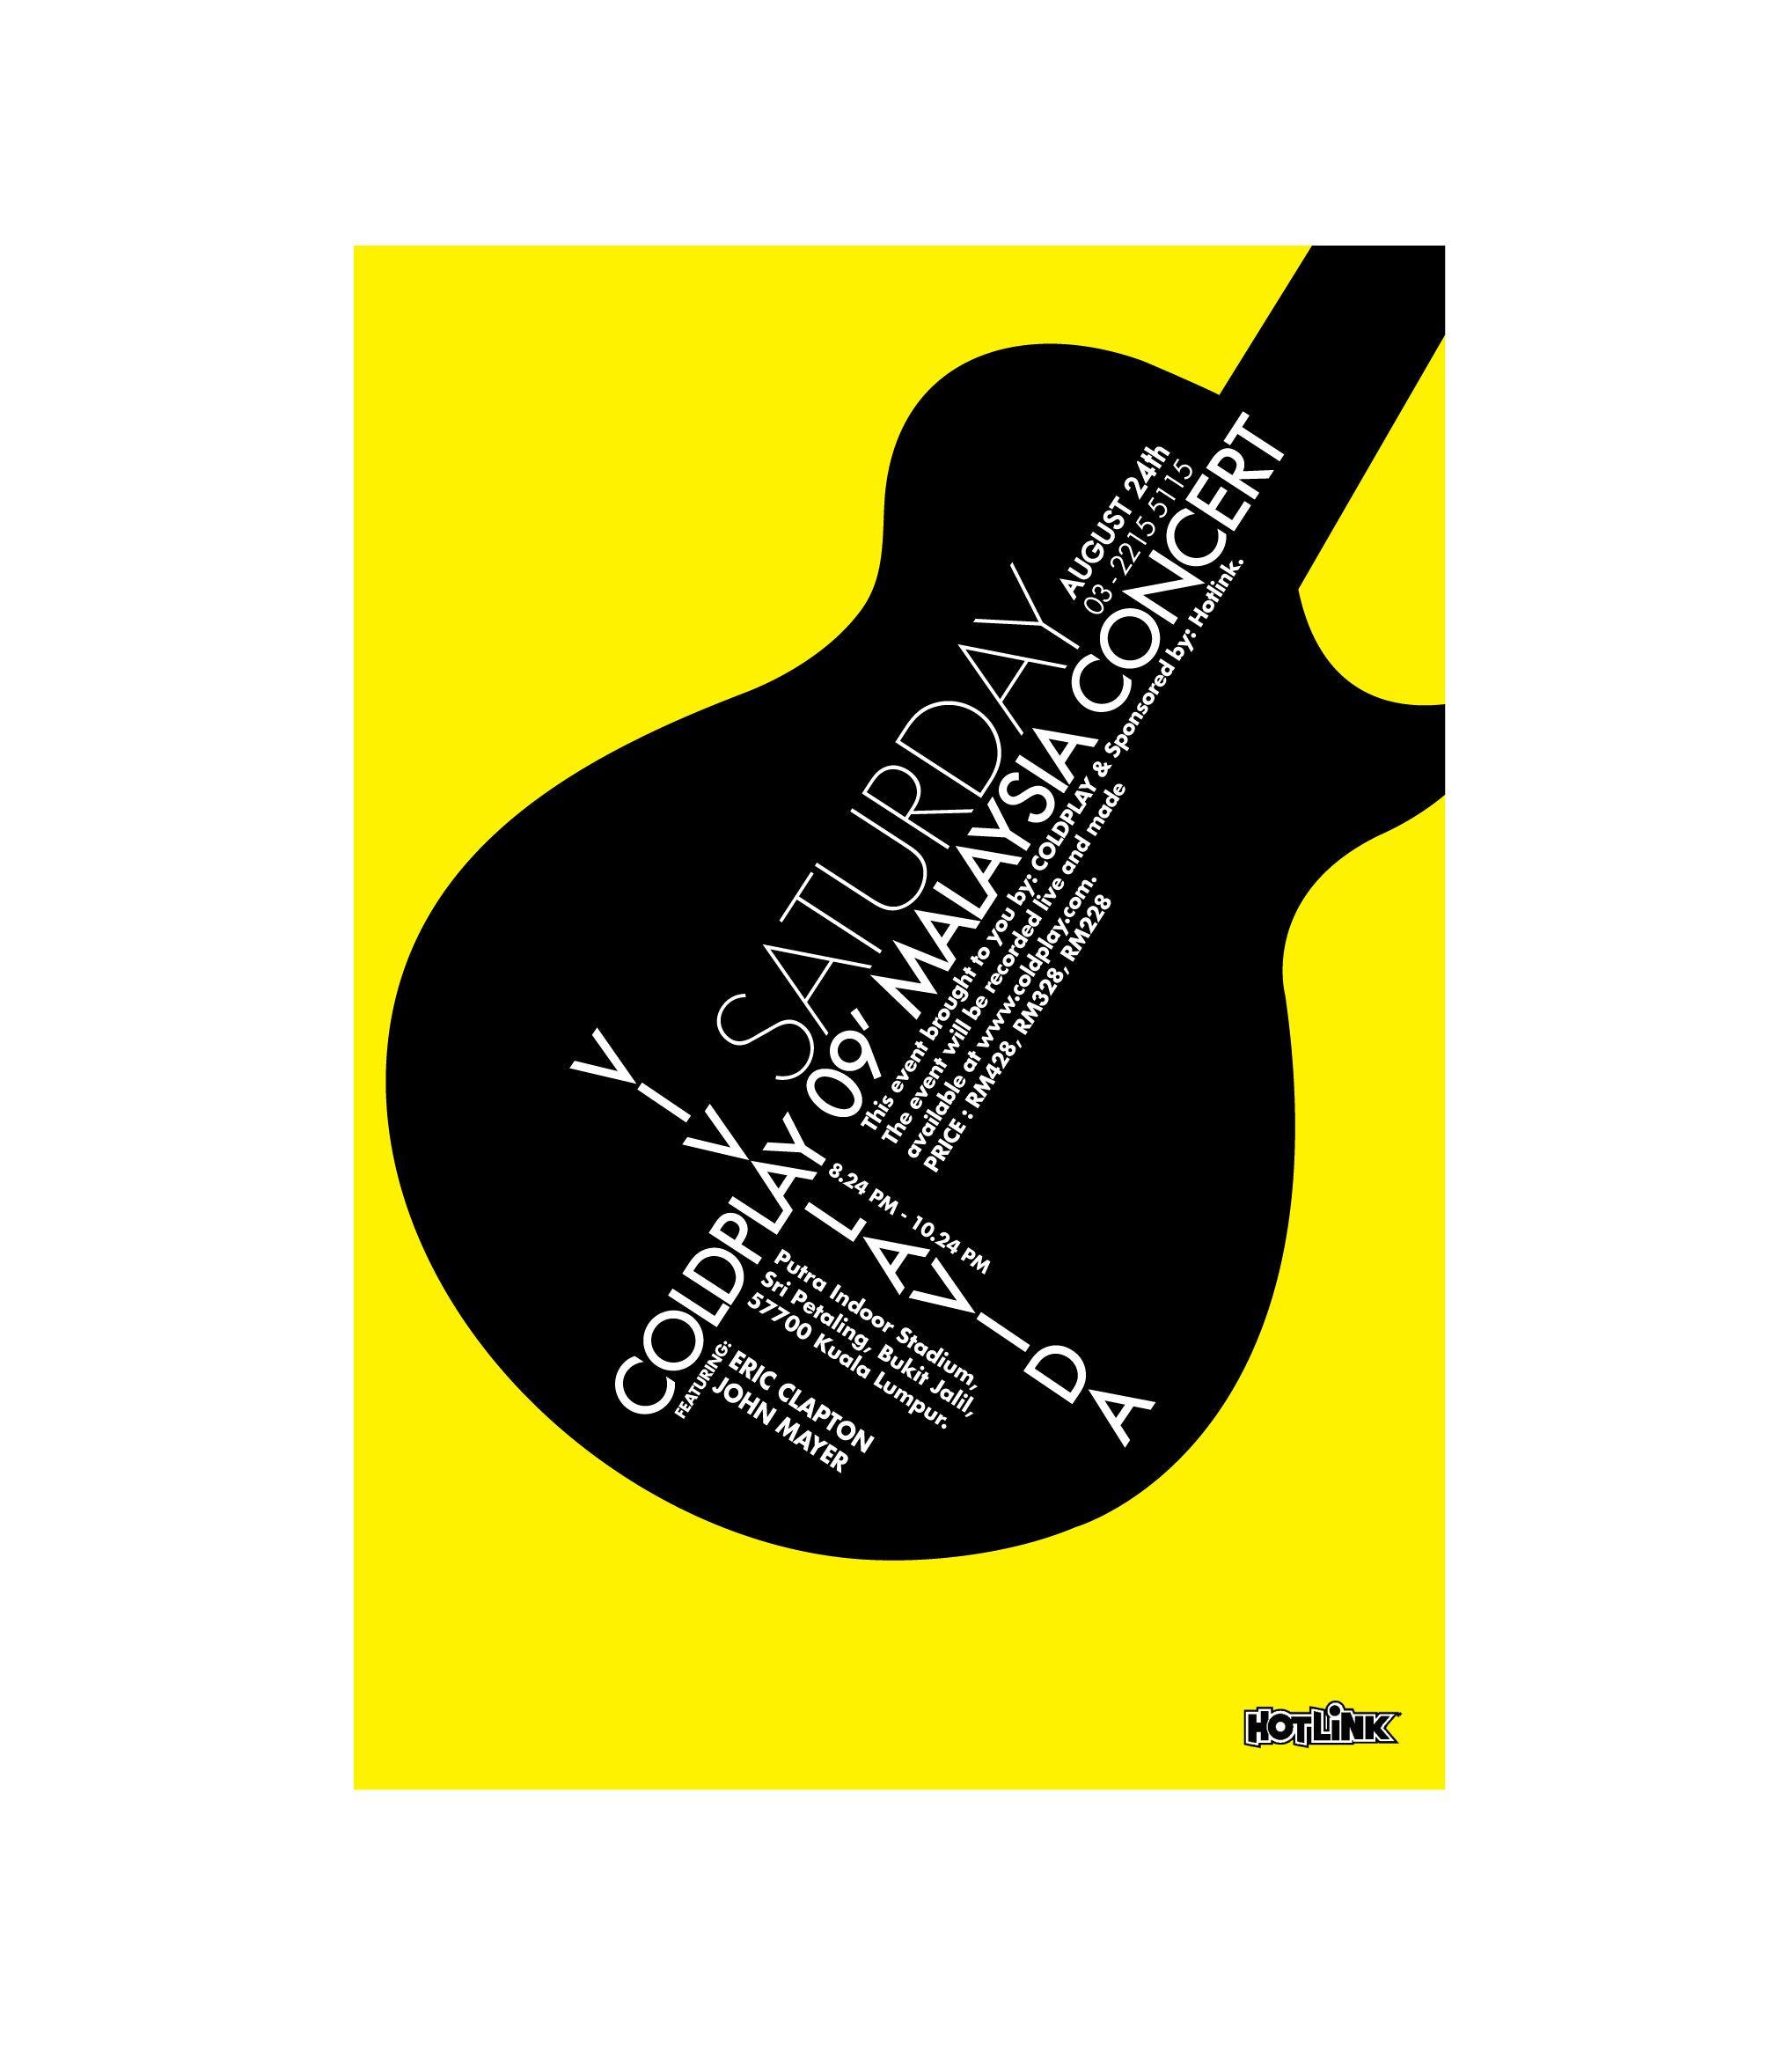 Design poster for concert - Guitar Graphic Art Google Search Event Postersband Postersconcert